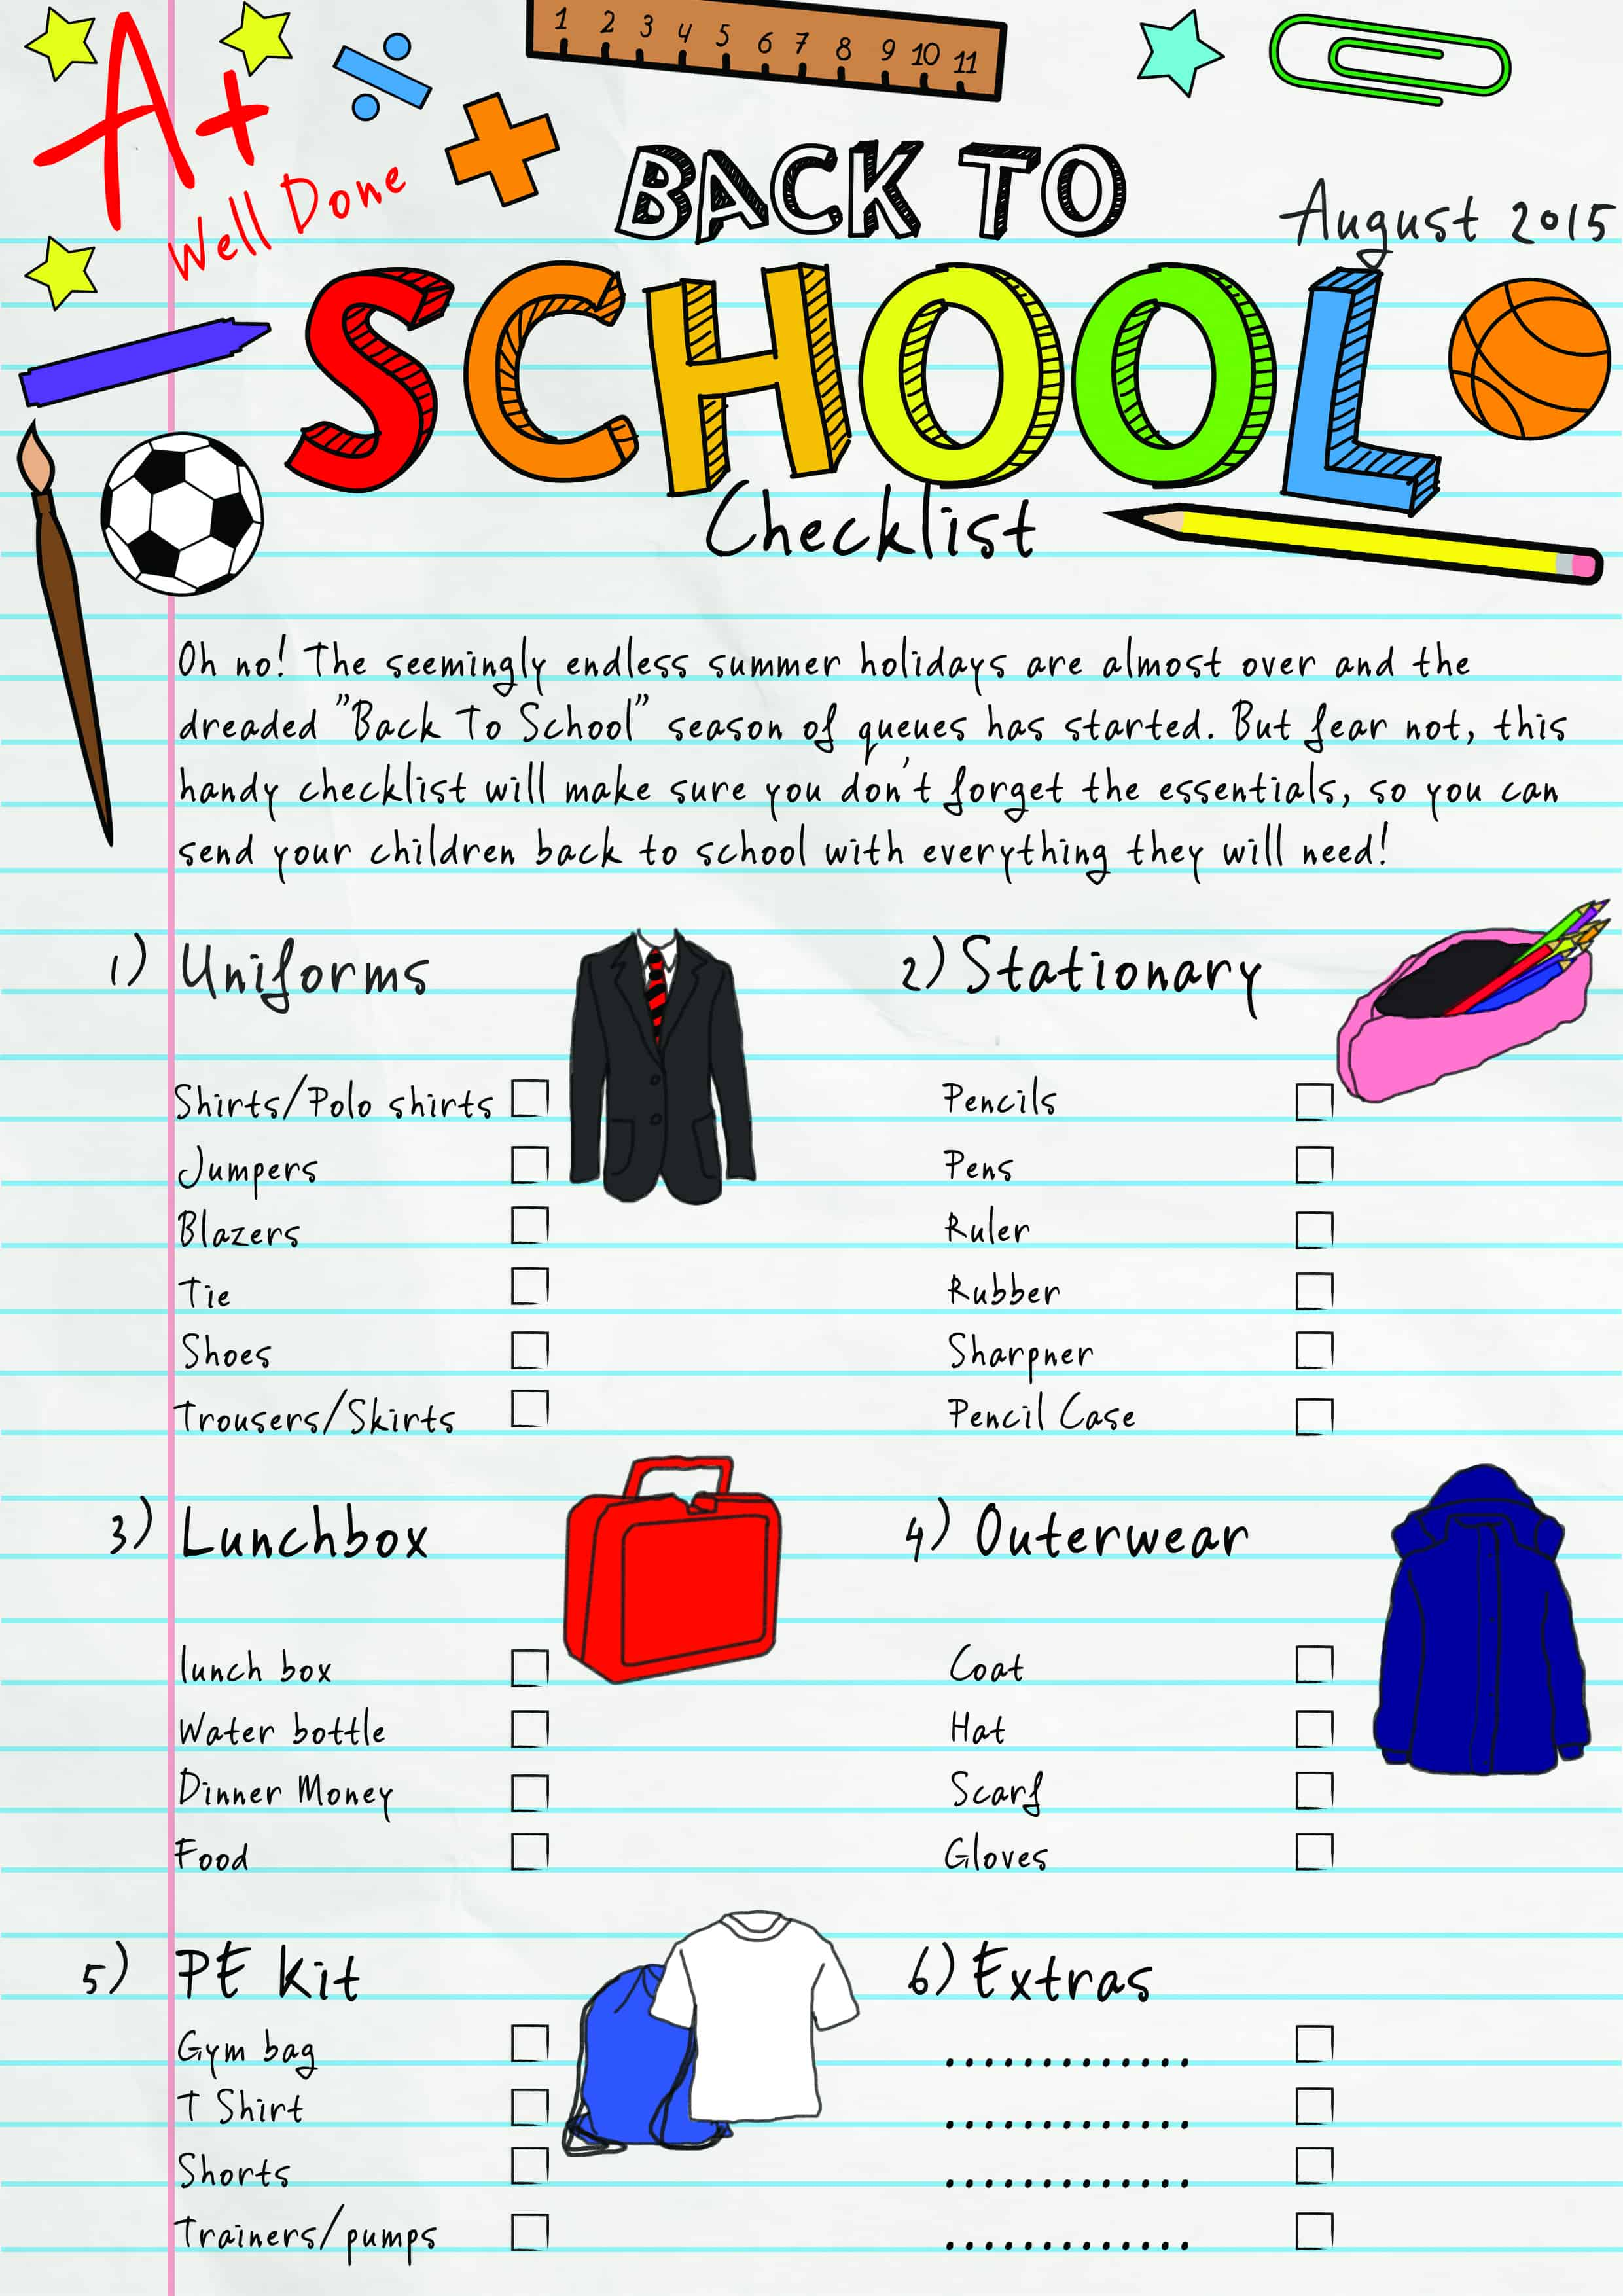 Back to school checklist Print